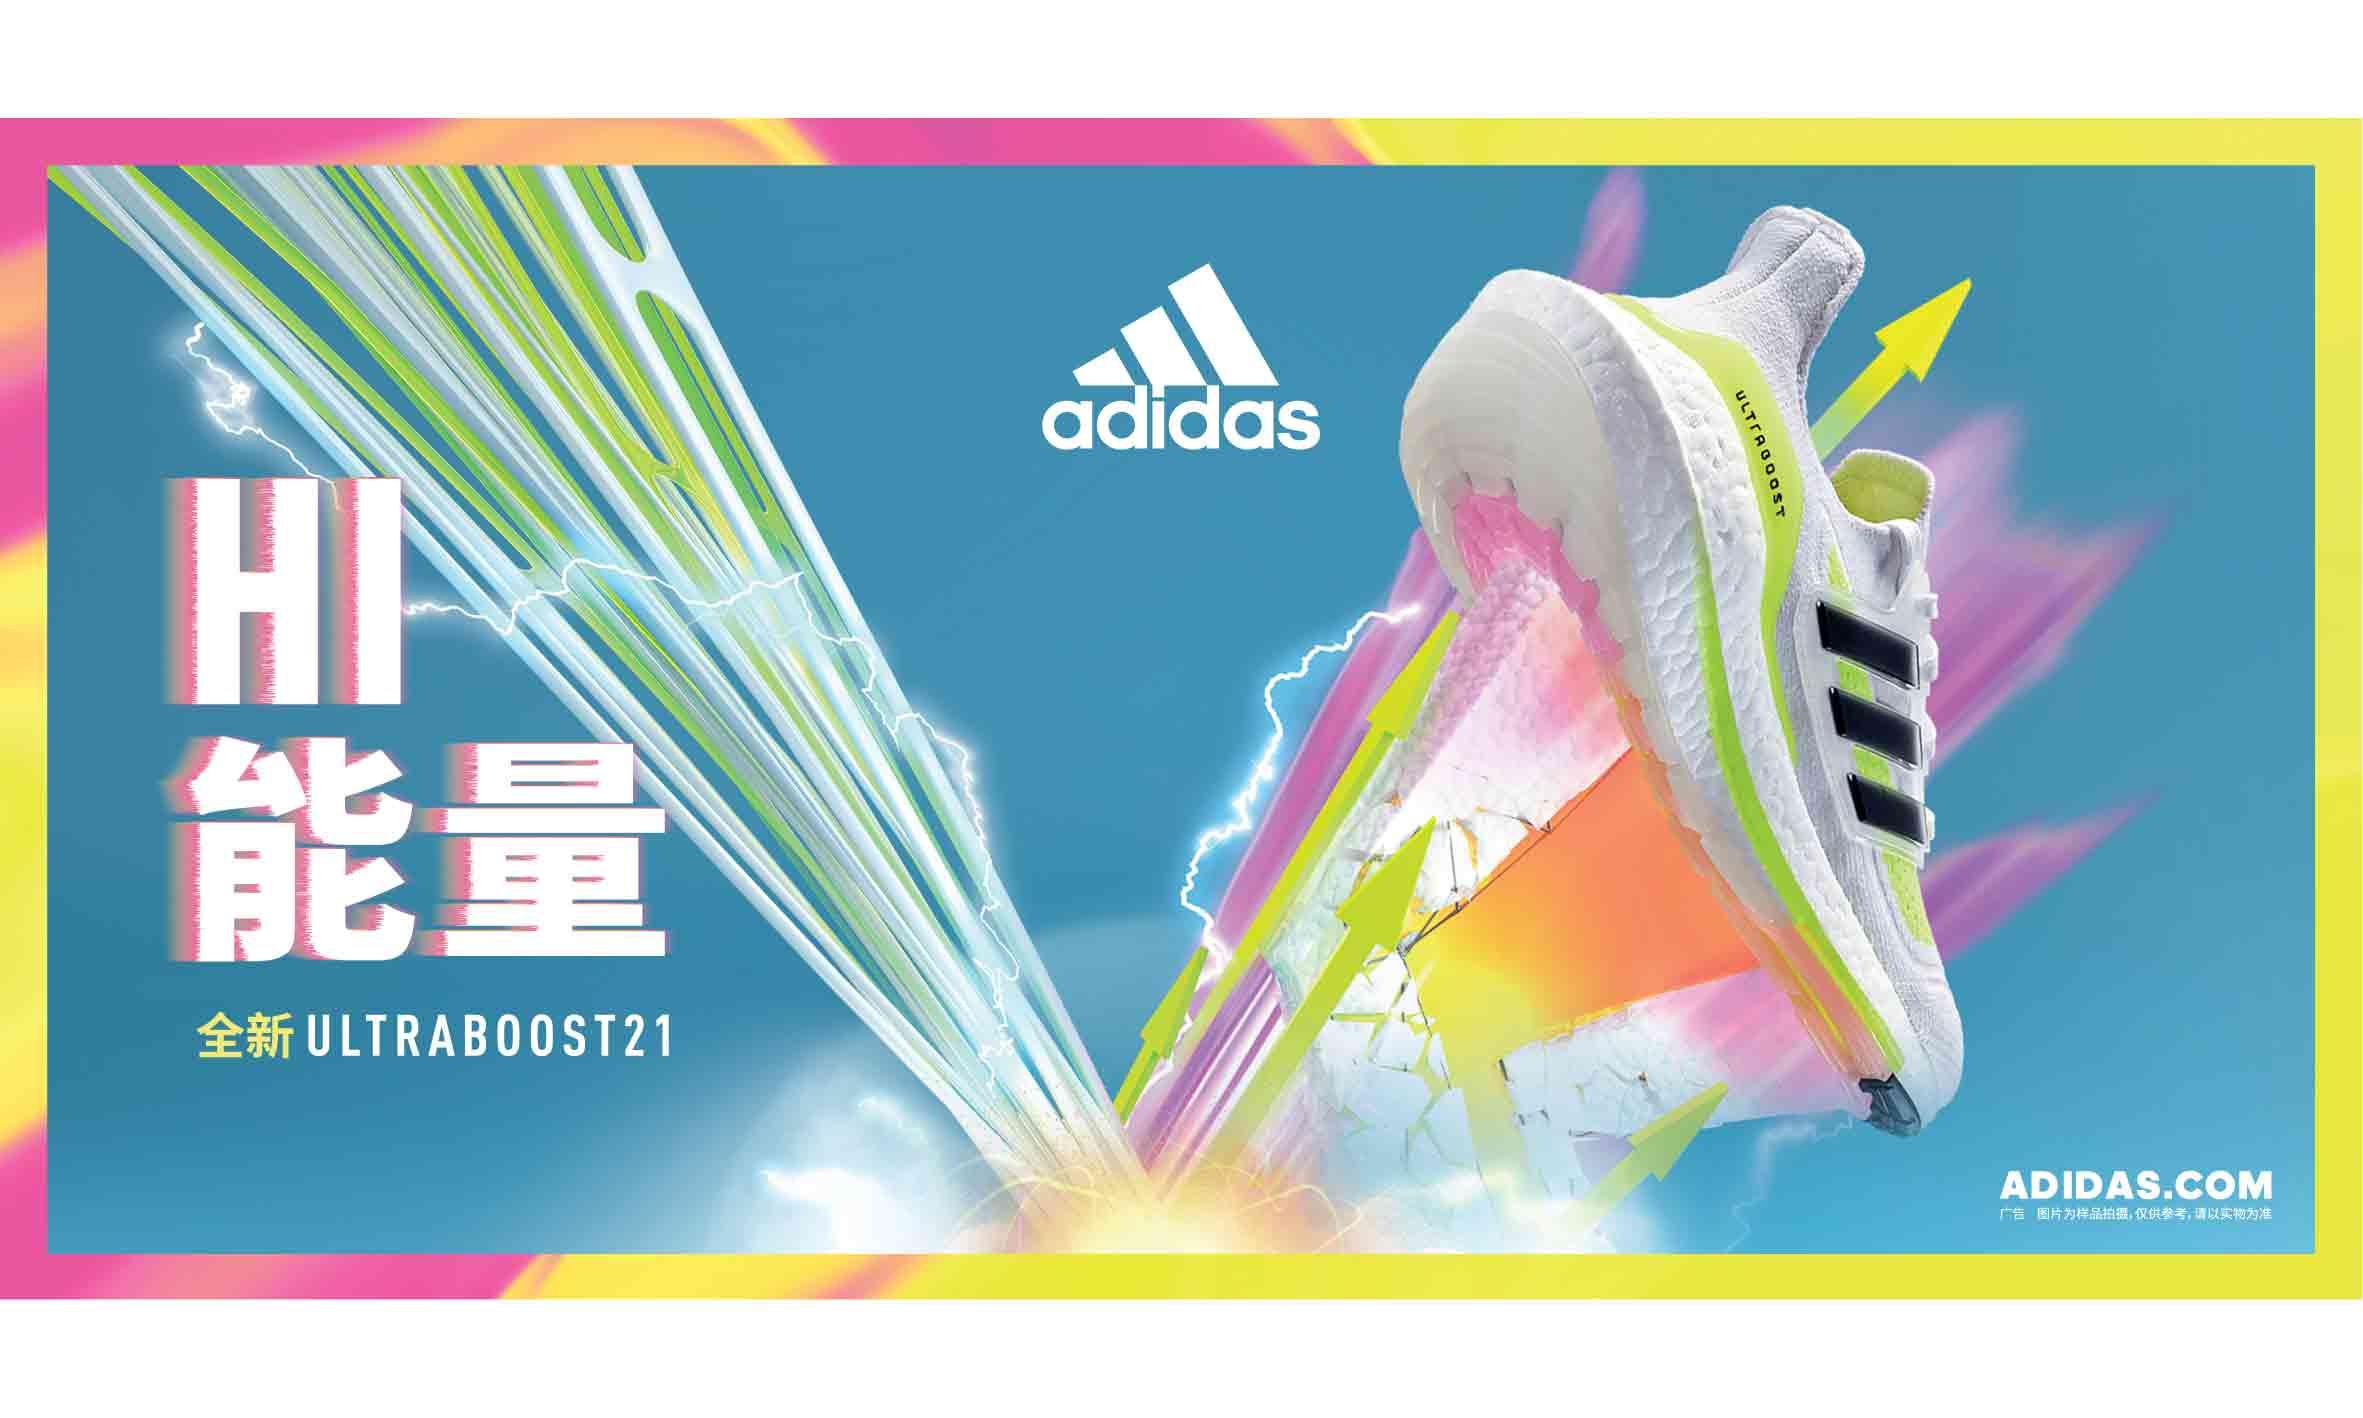 adidas ULTRABOOST 21「高能黄」新配色登场